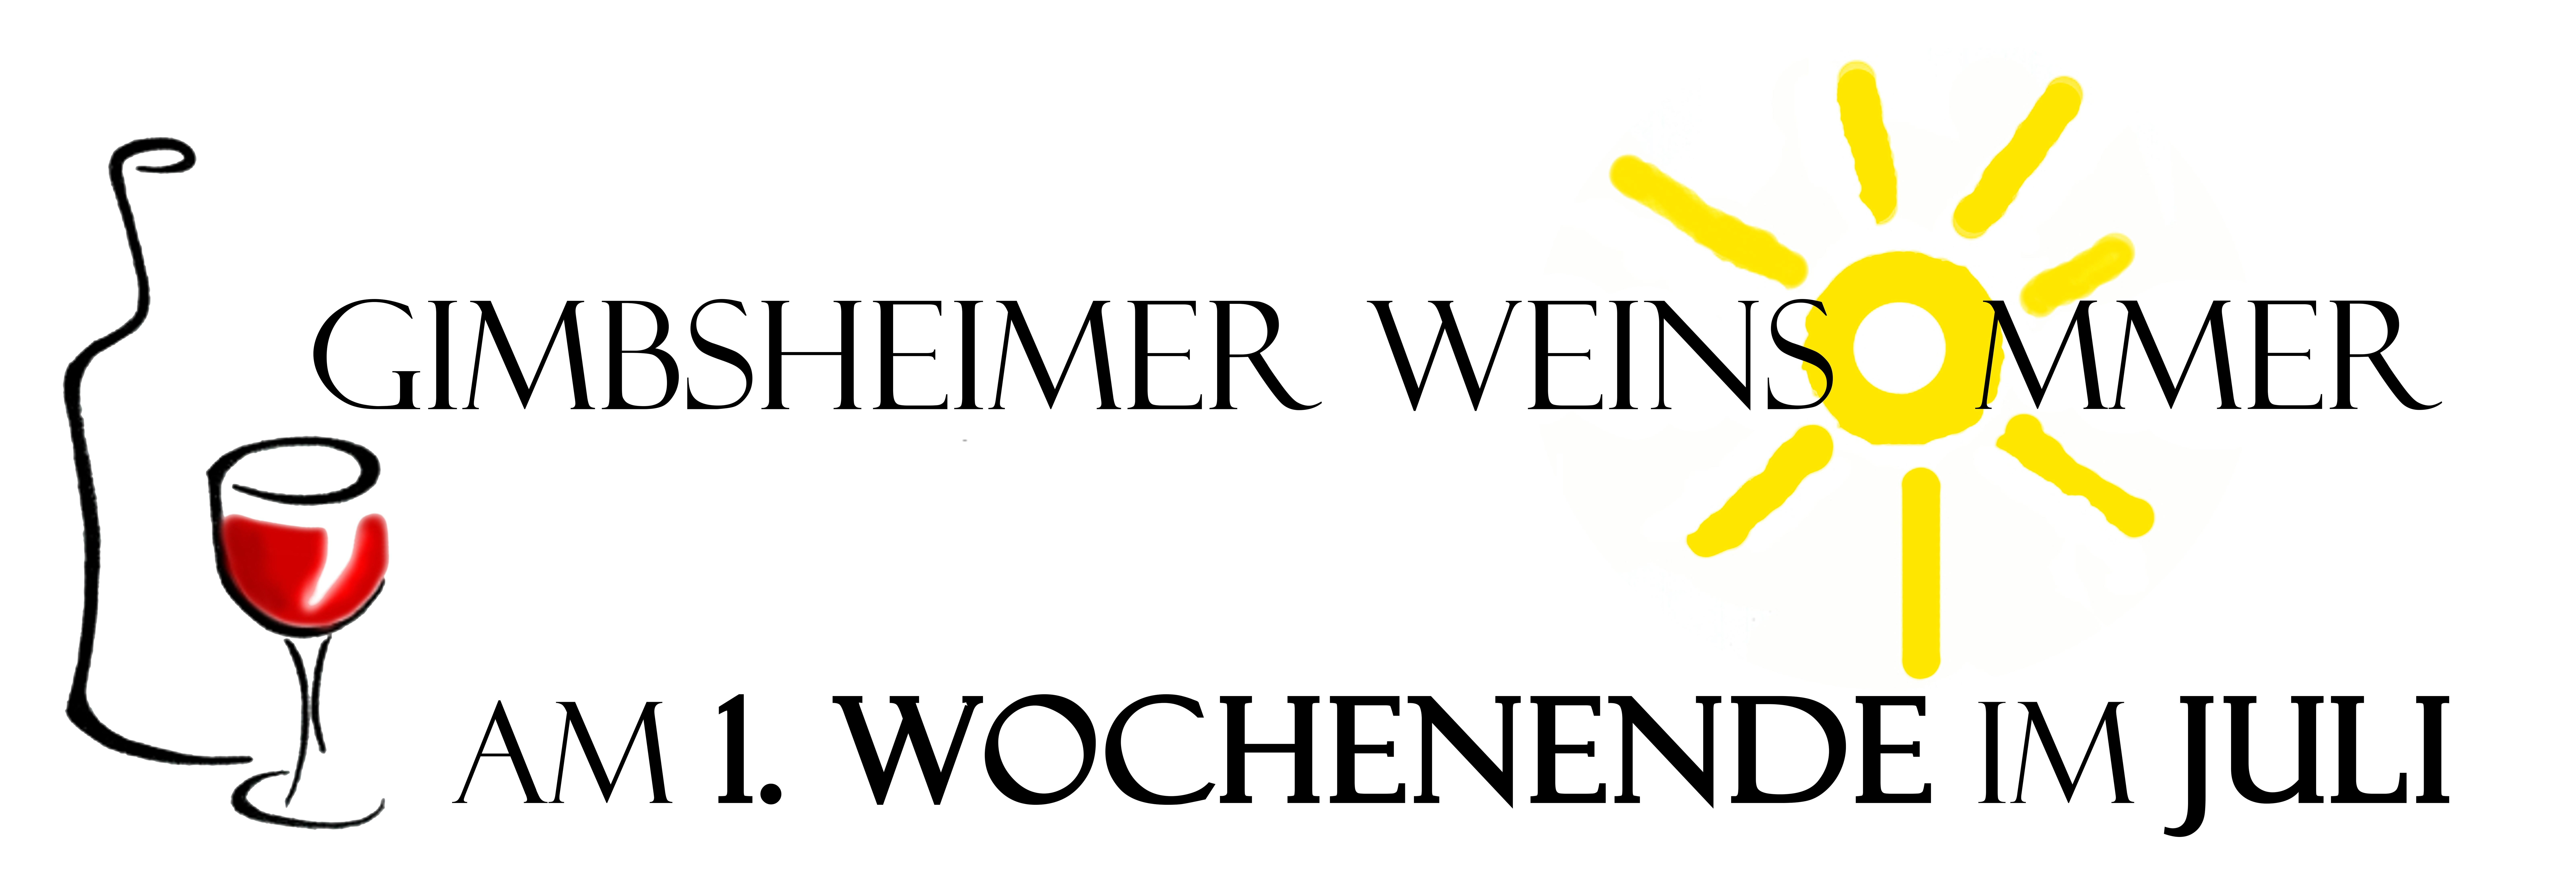 Das Blasorchester beim 1. Gimbsheimer Weinsommer